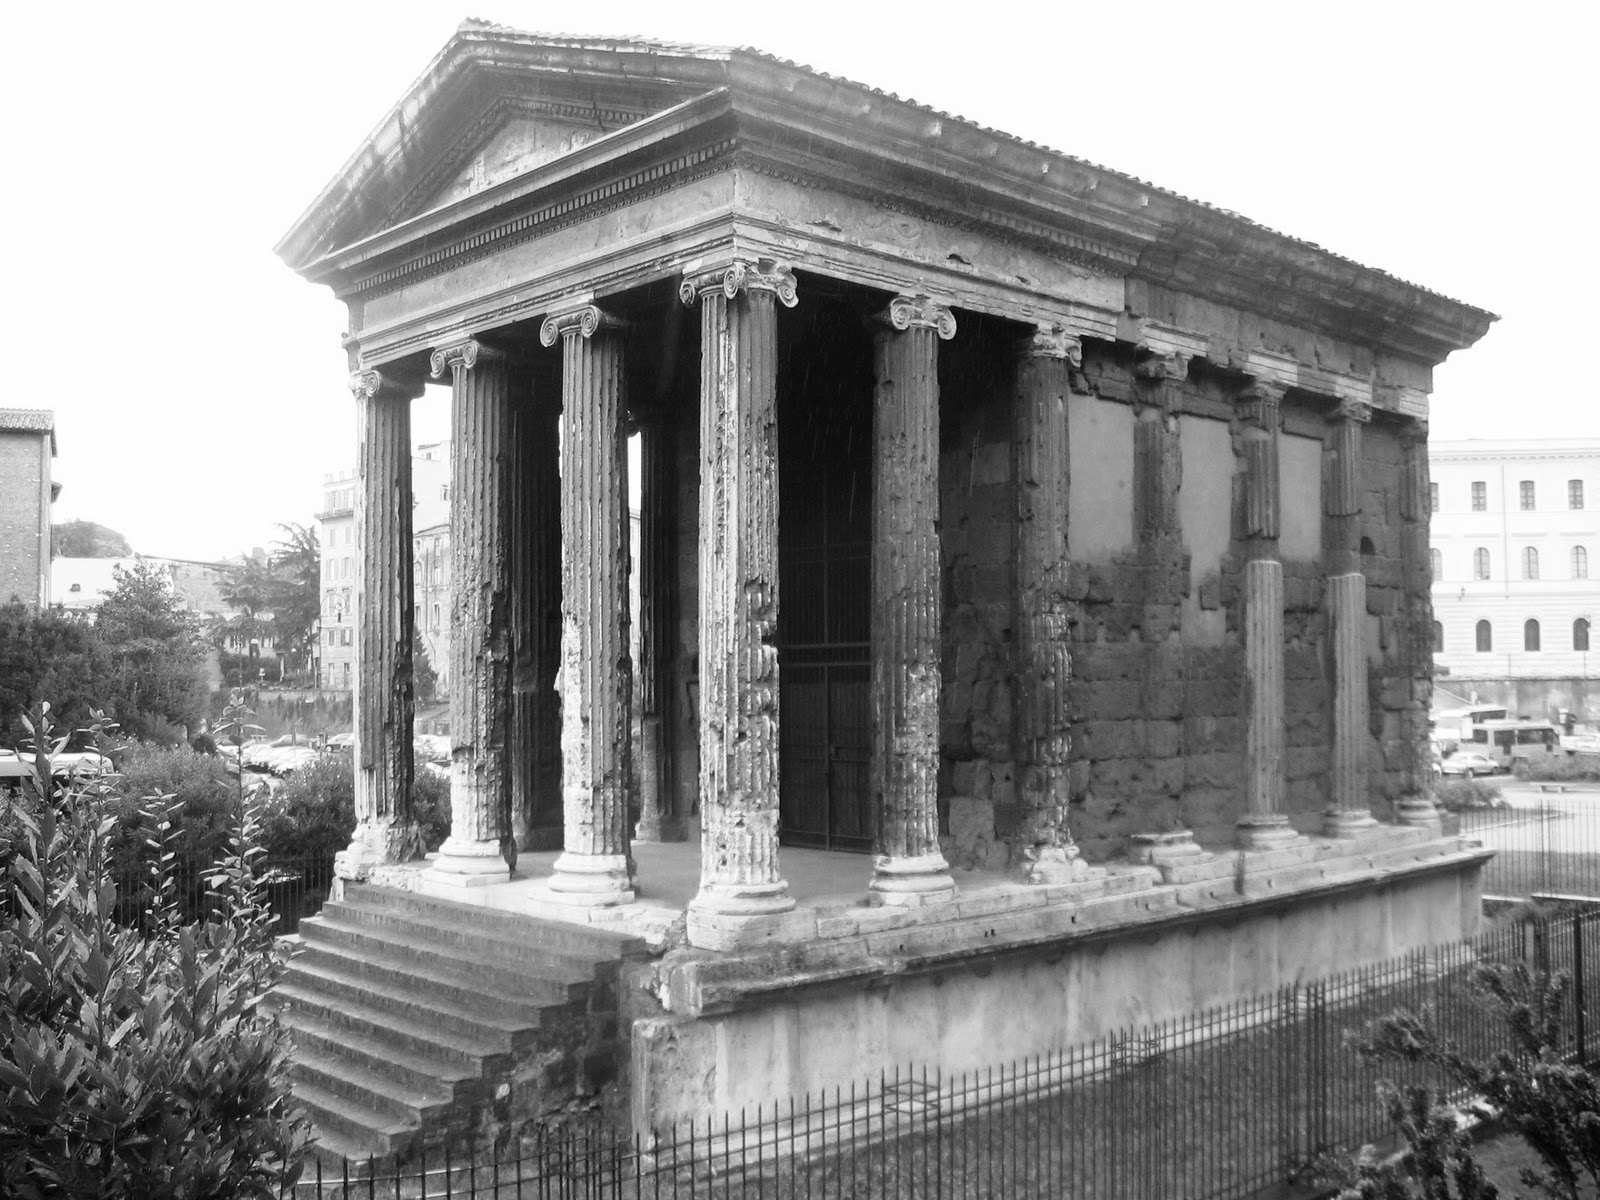 external image Roma_-_Tempio_di_portunus02%255B1%255D.jpg